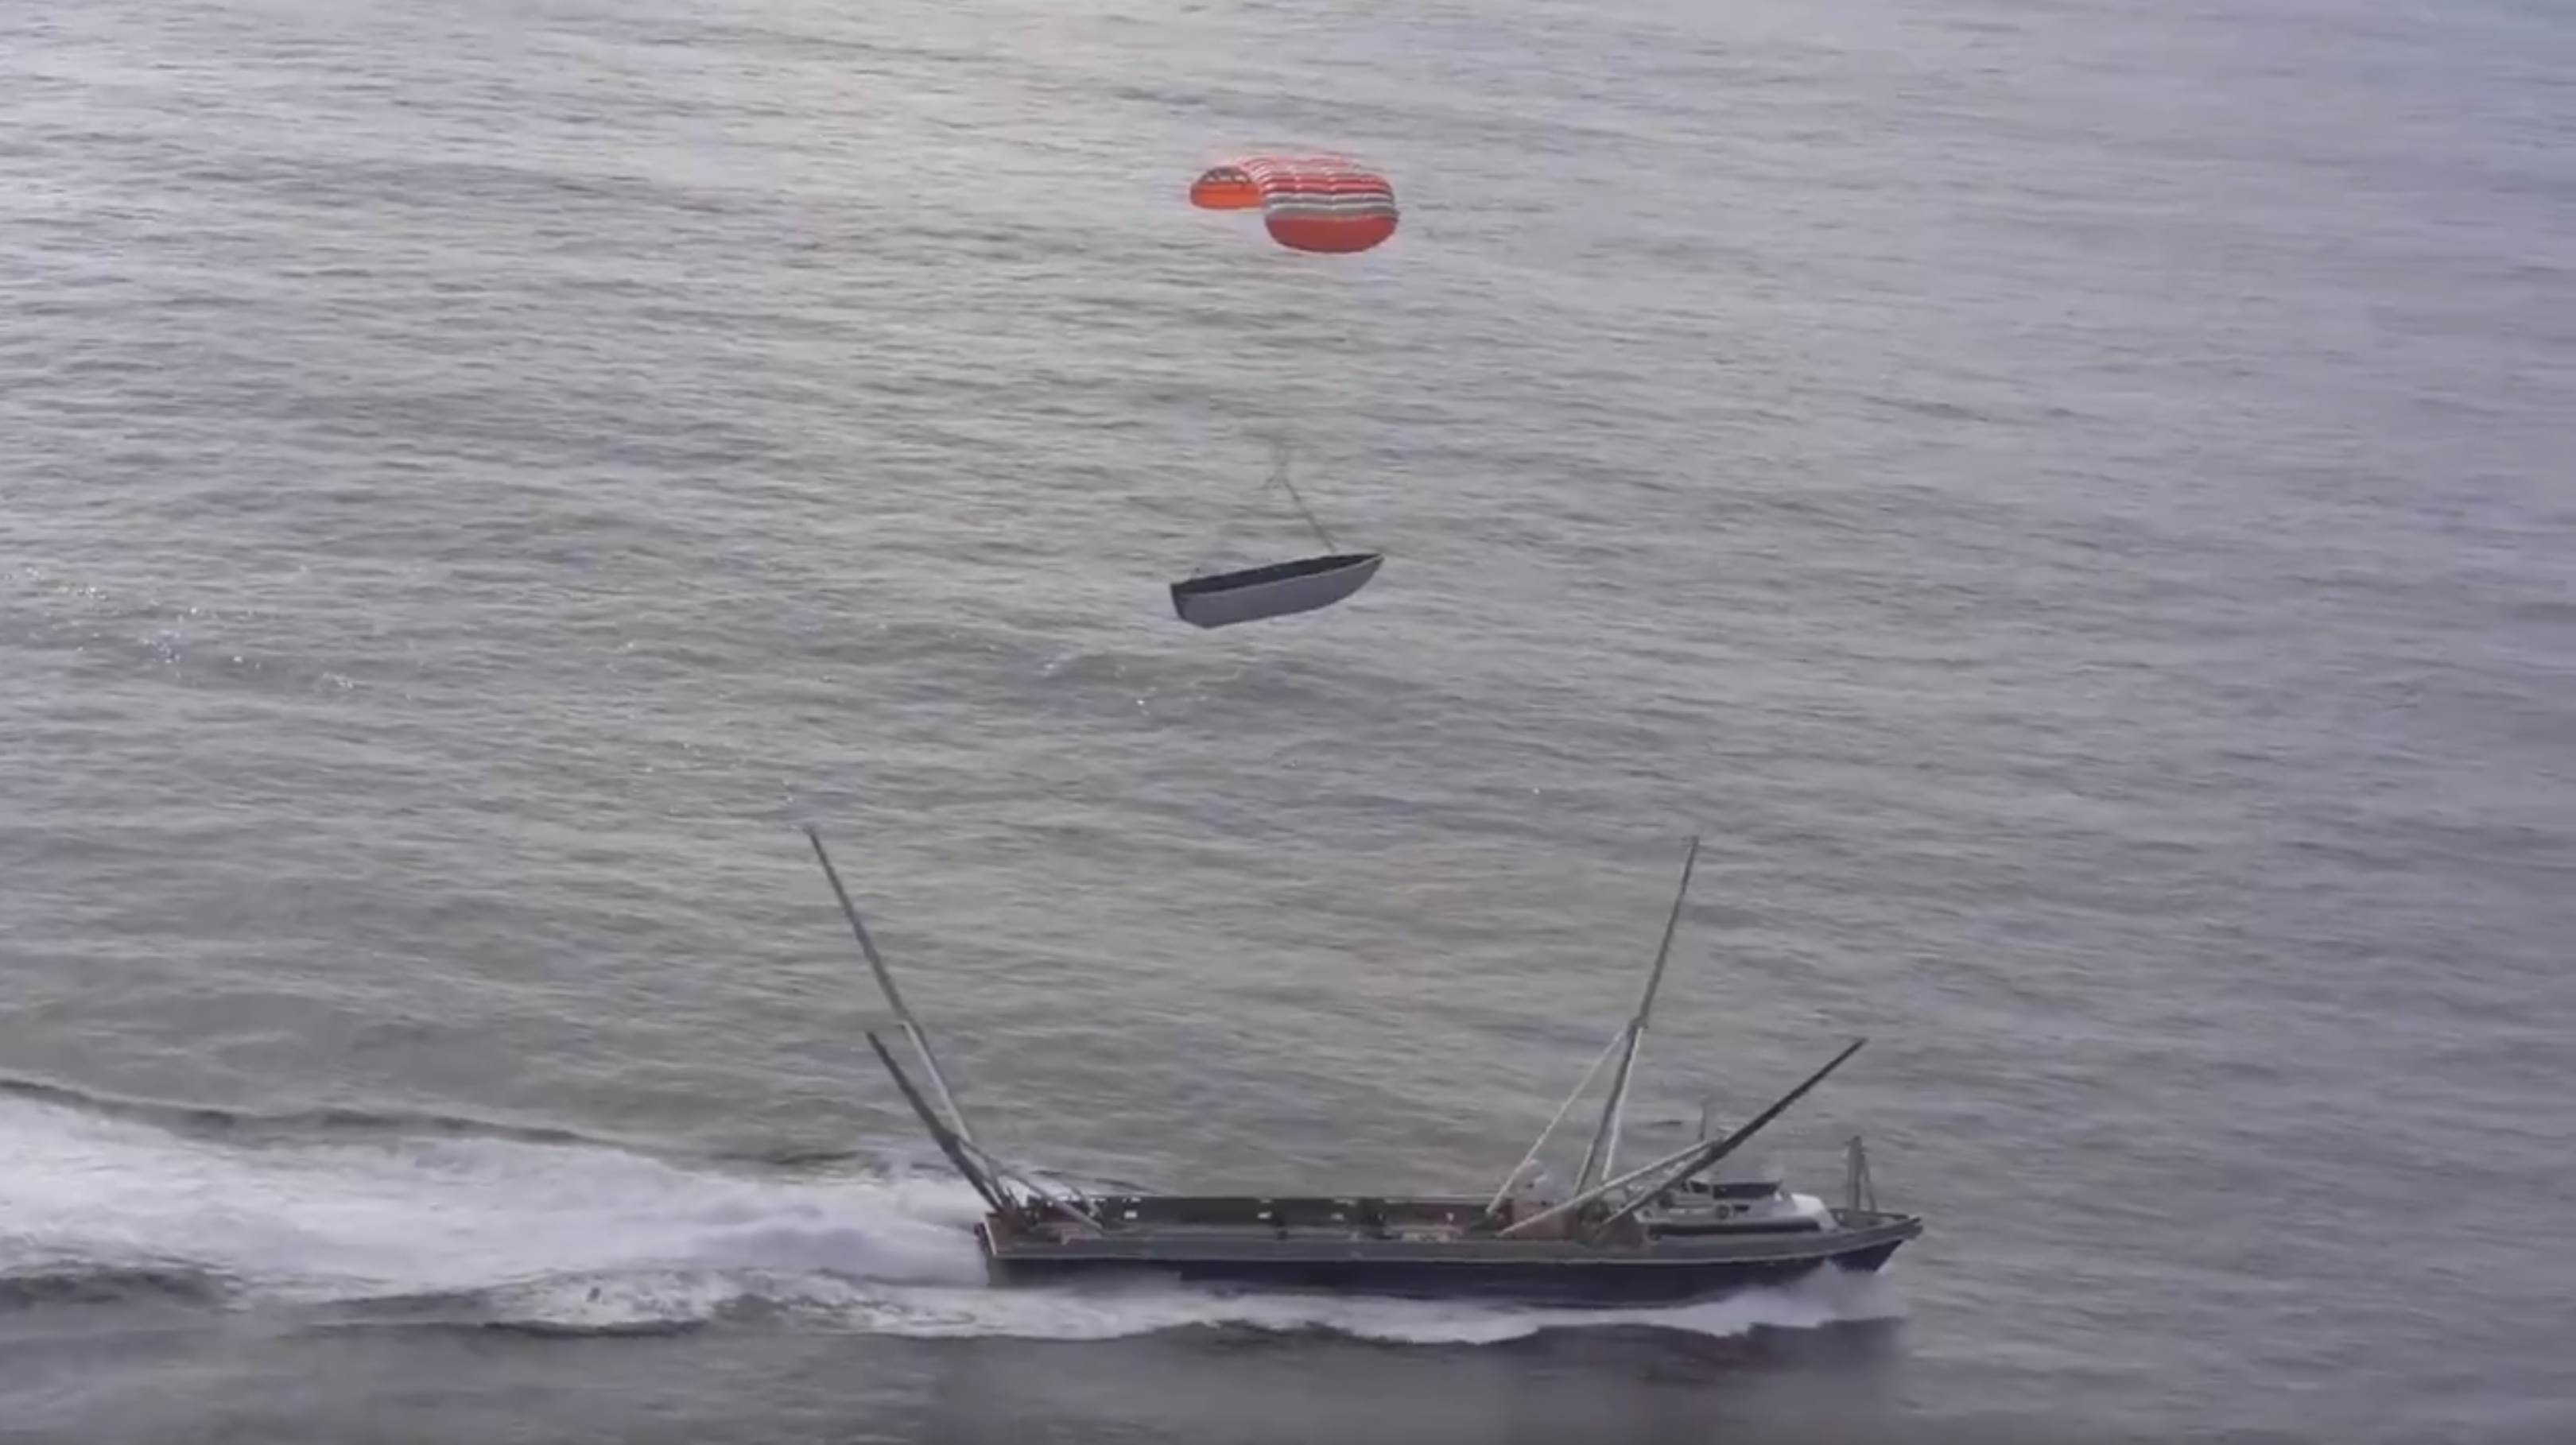 Mr Steven fairing drop test near miss Jan 2019 (SpaceX) 2